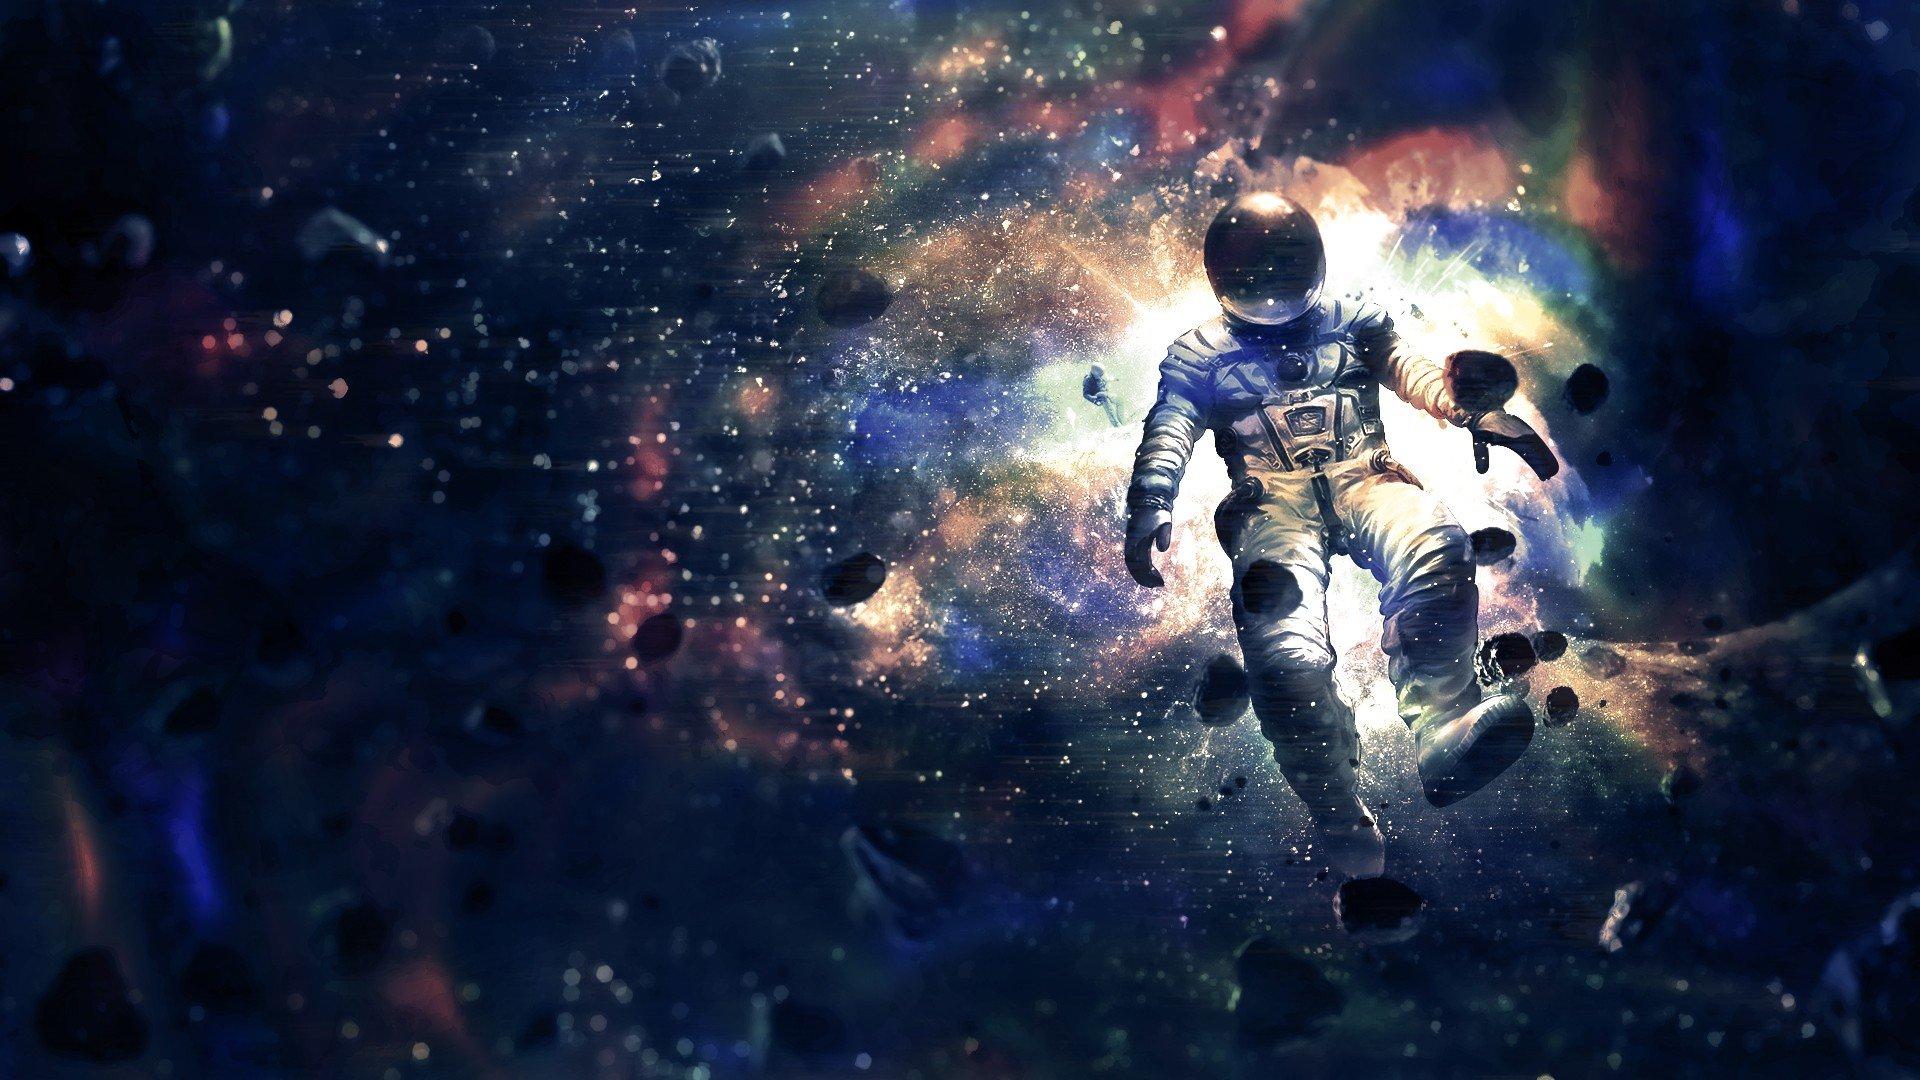 Space calm lsd drugs fantacy hd wallpapers desktop for Drugs in space